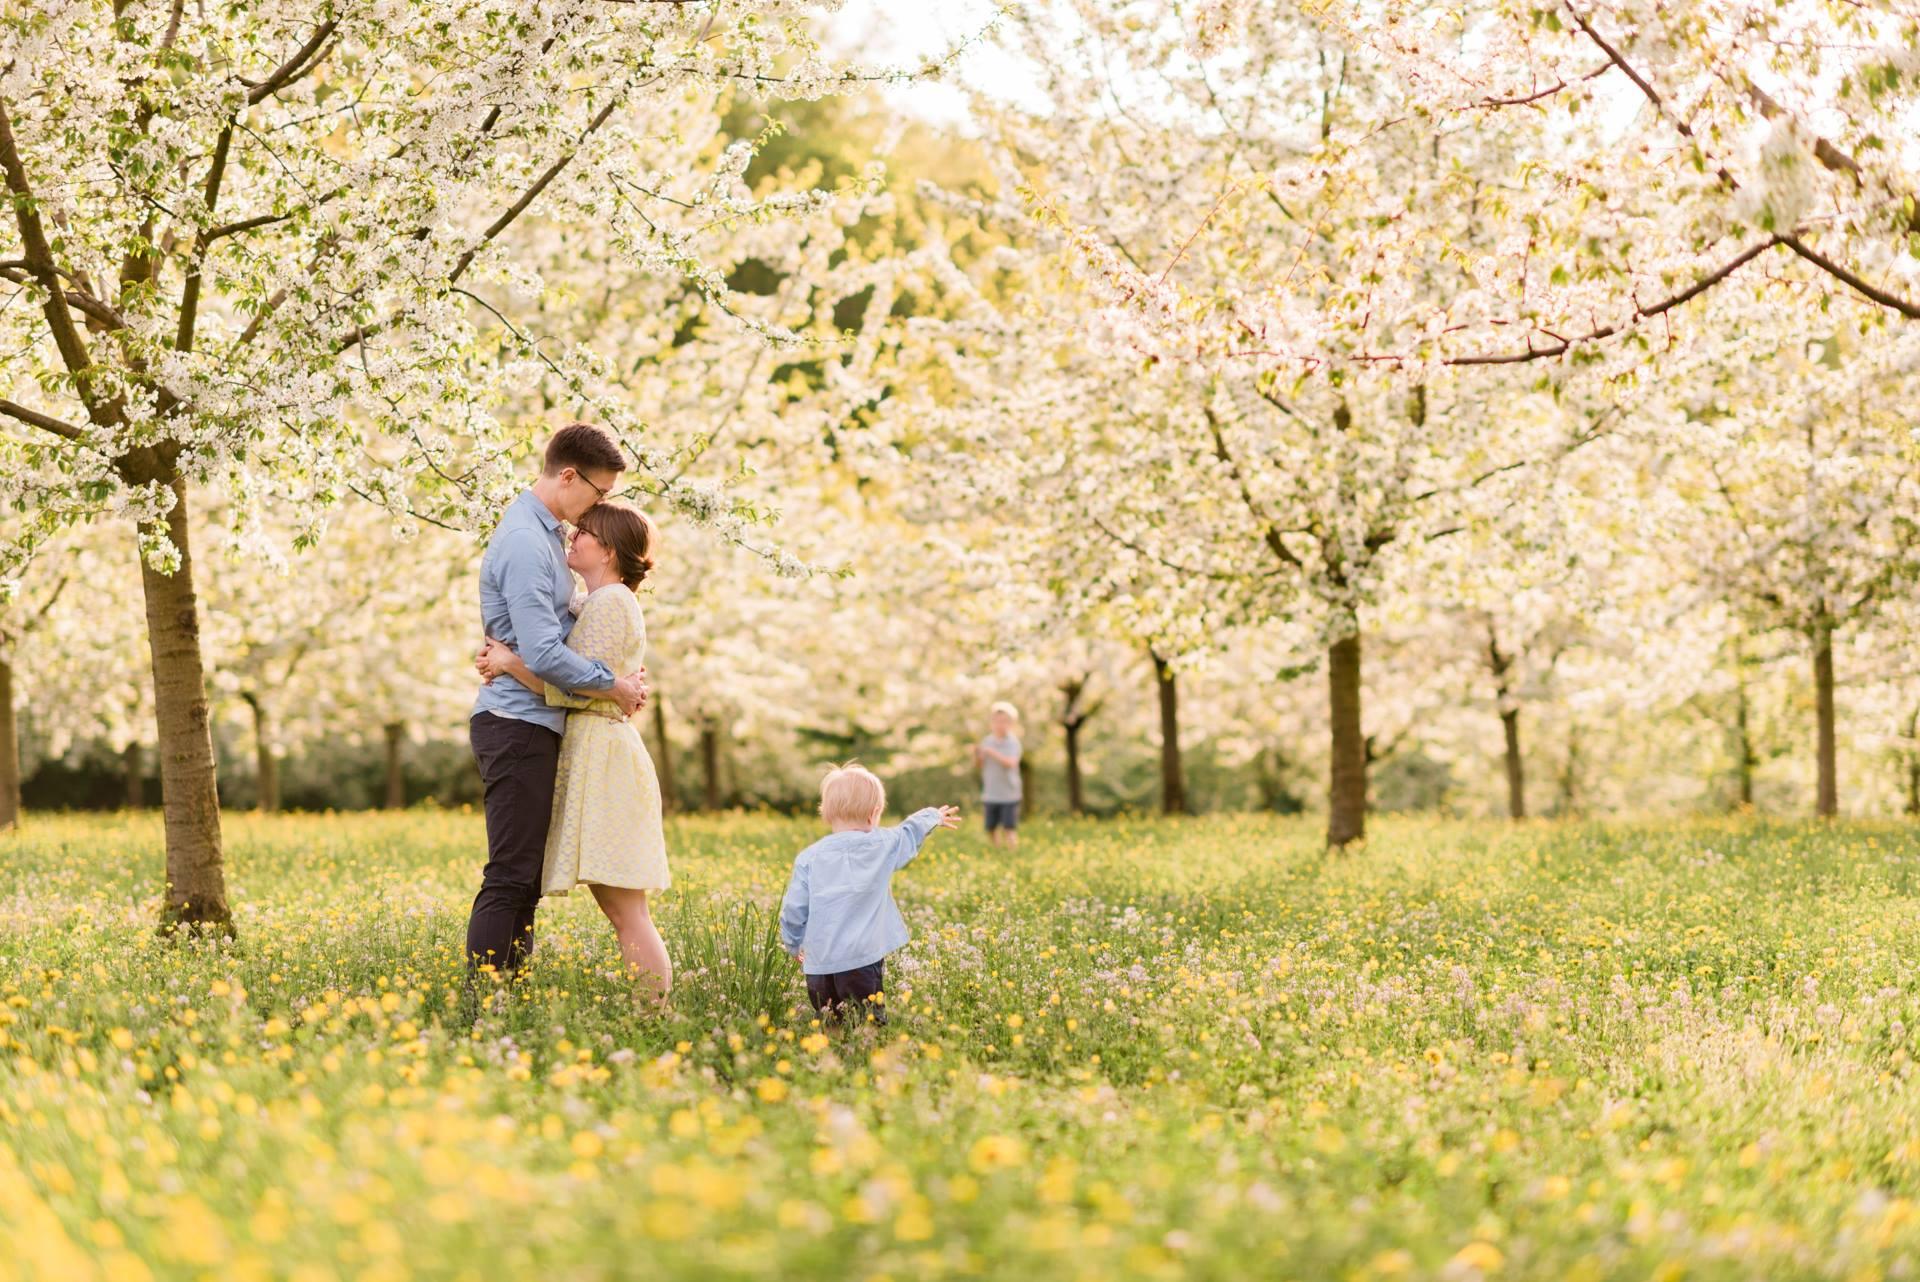 family posing made easy online photography course by photographer elena s blair   amanda joy hilfer